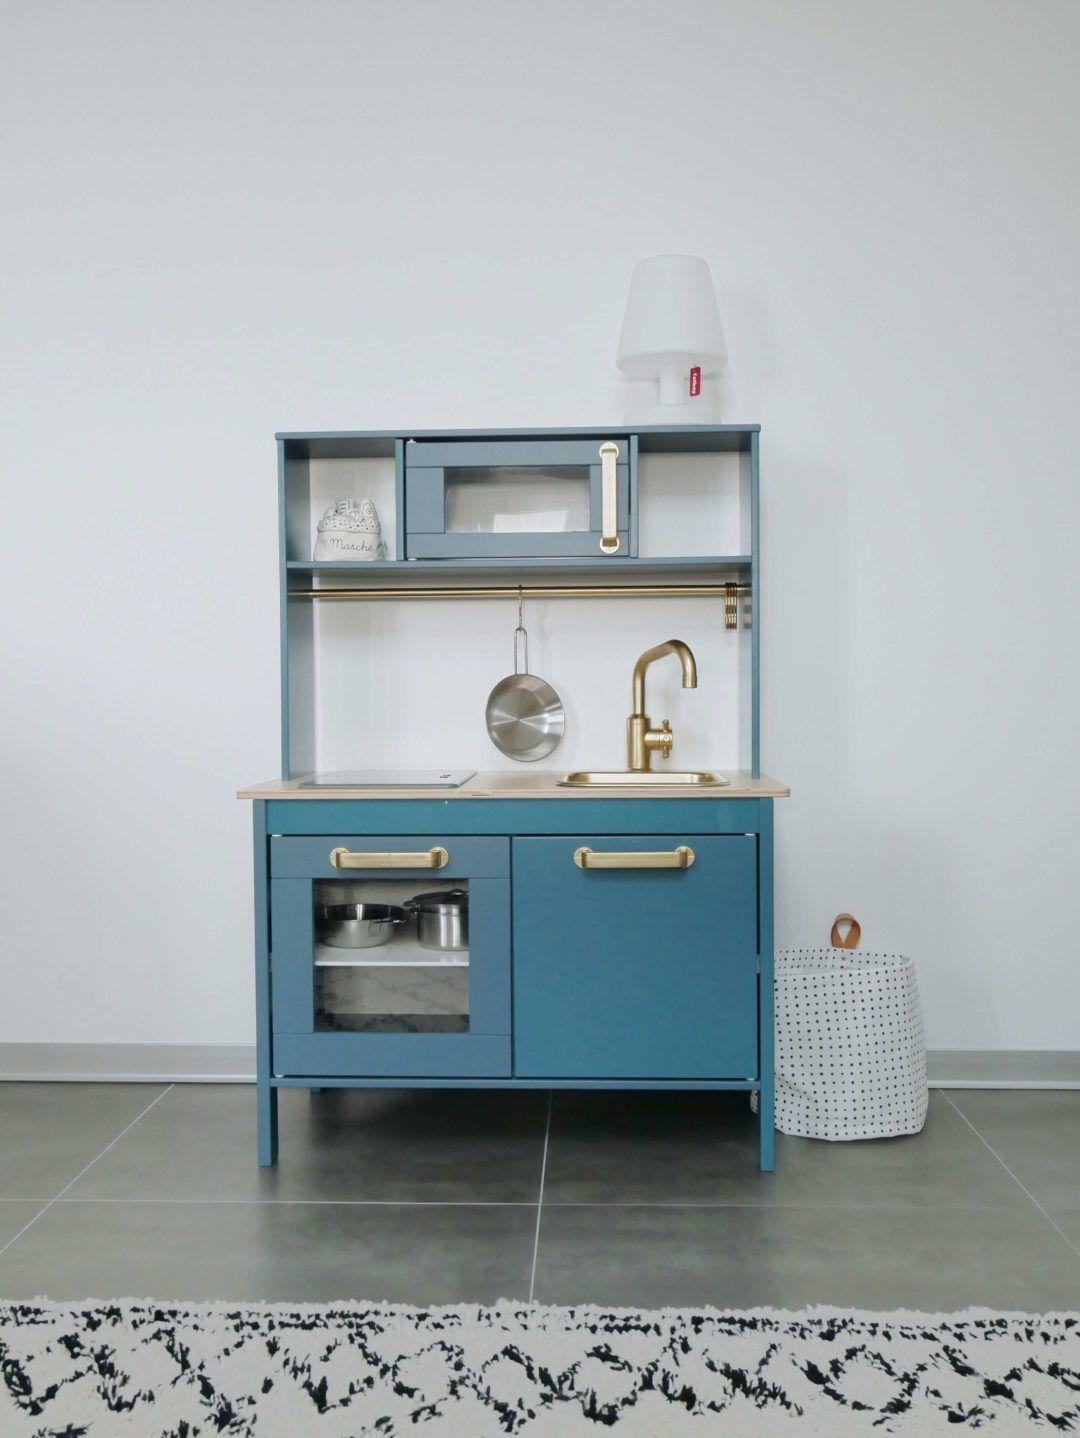 cuisine ikea cozinha ikea pinterest cuisine ikea ikea et cuisines. Black Bedroom Furniture Sets. Home Design Ideas